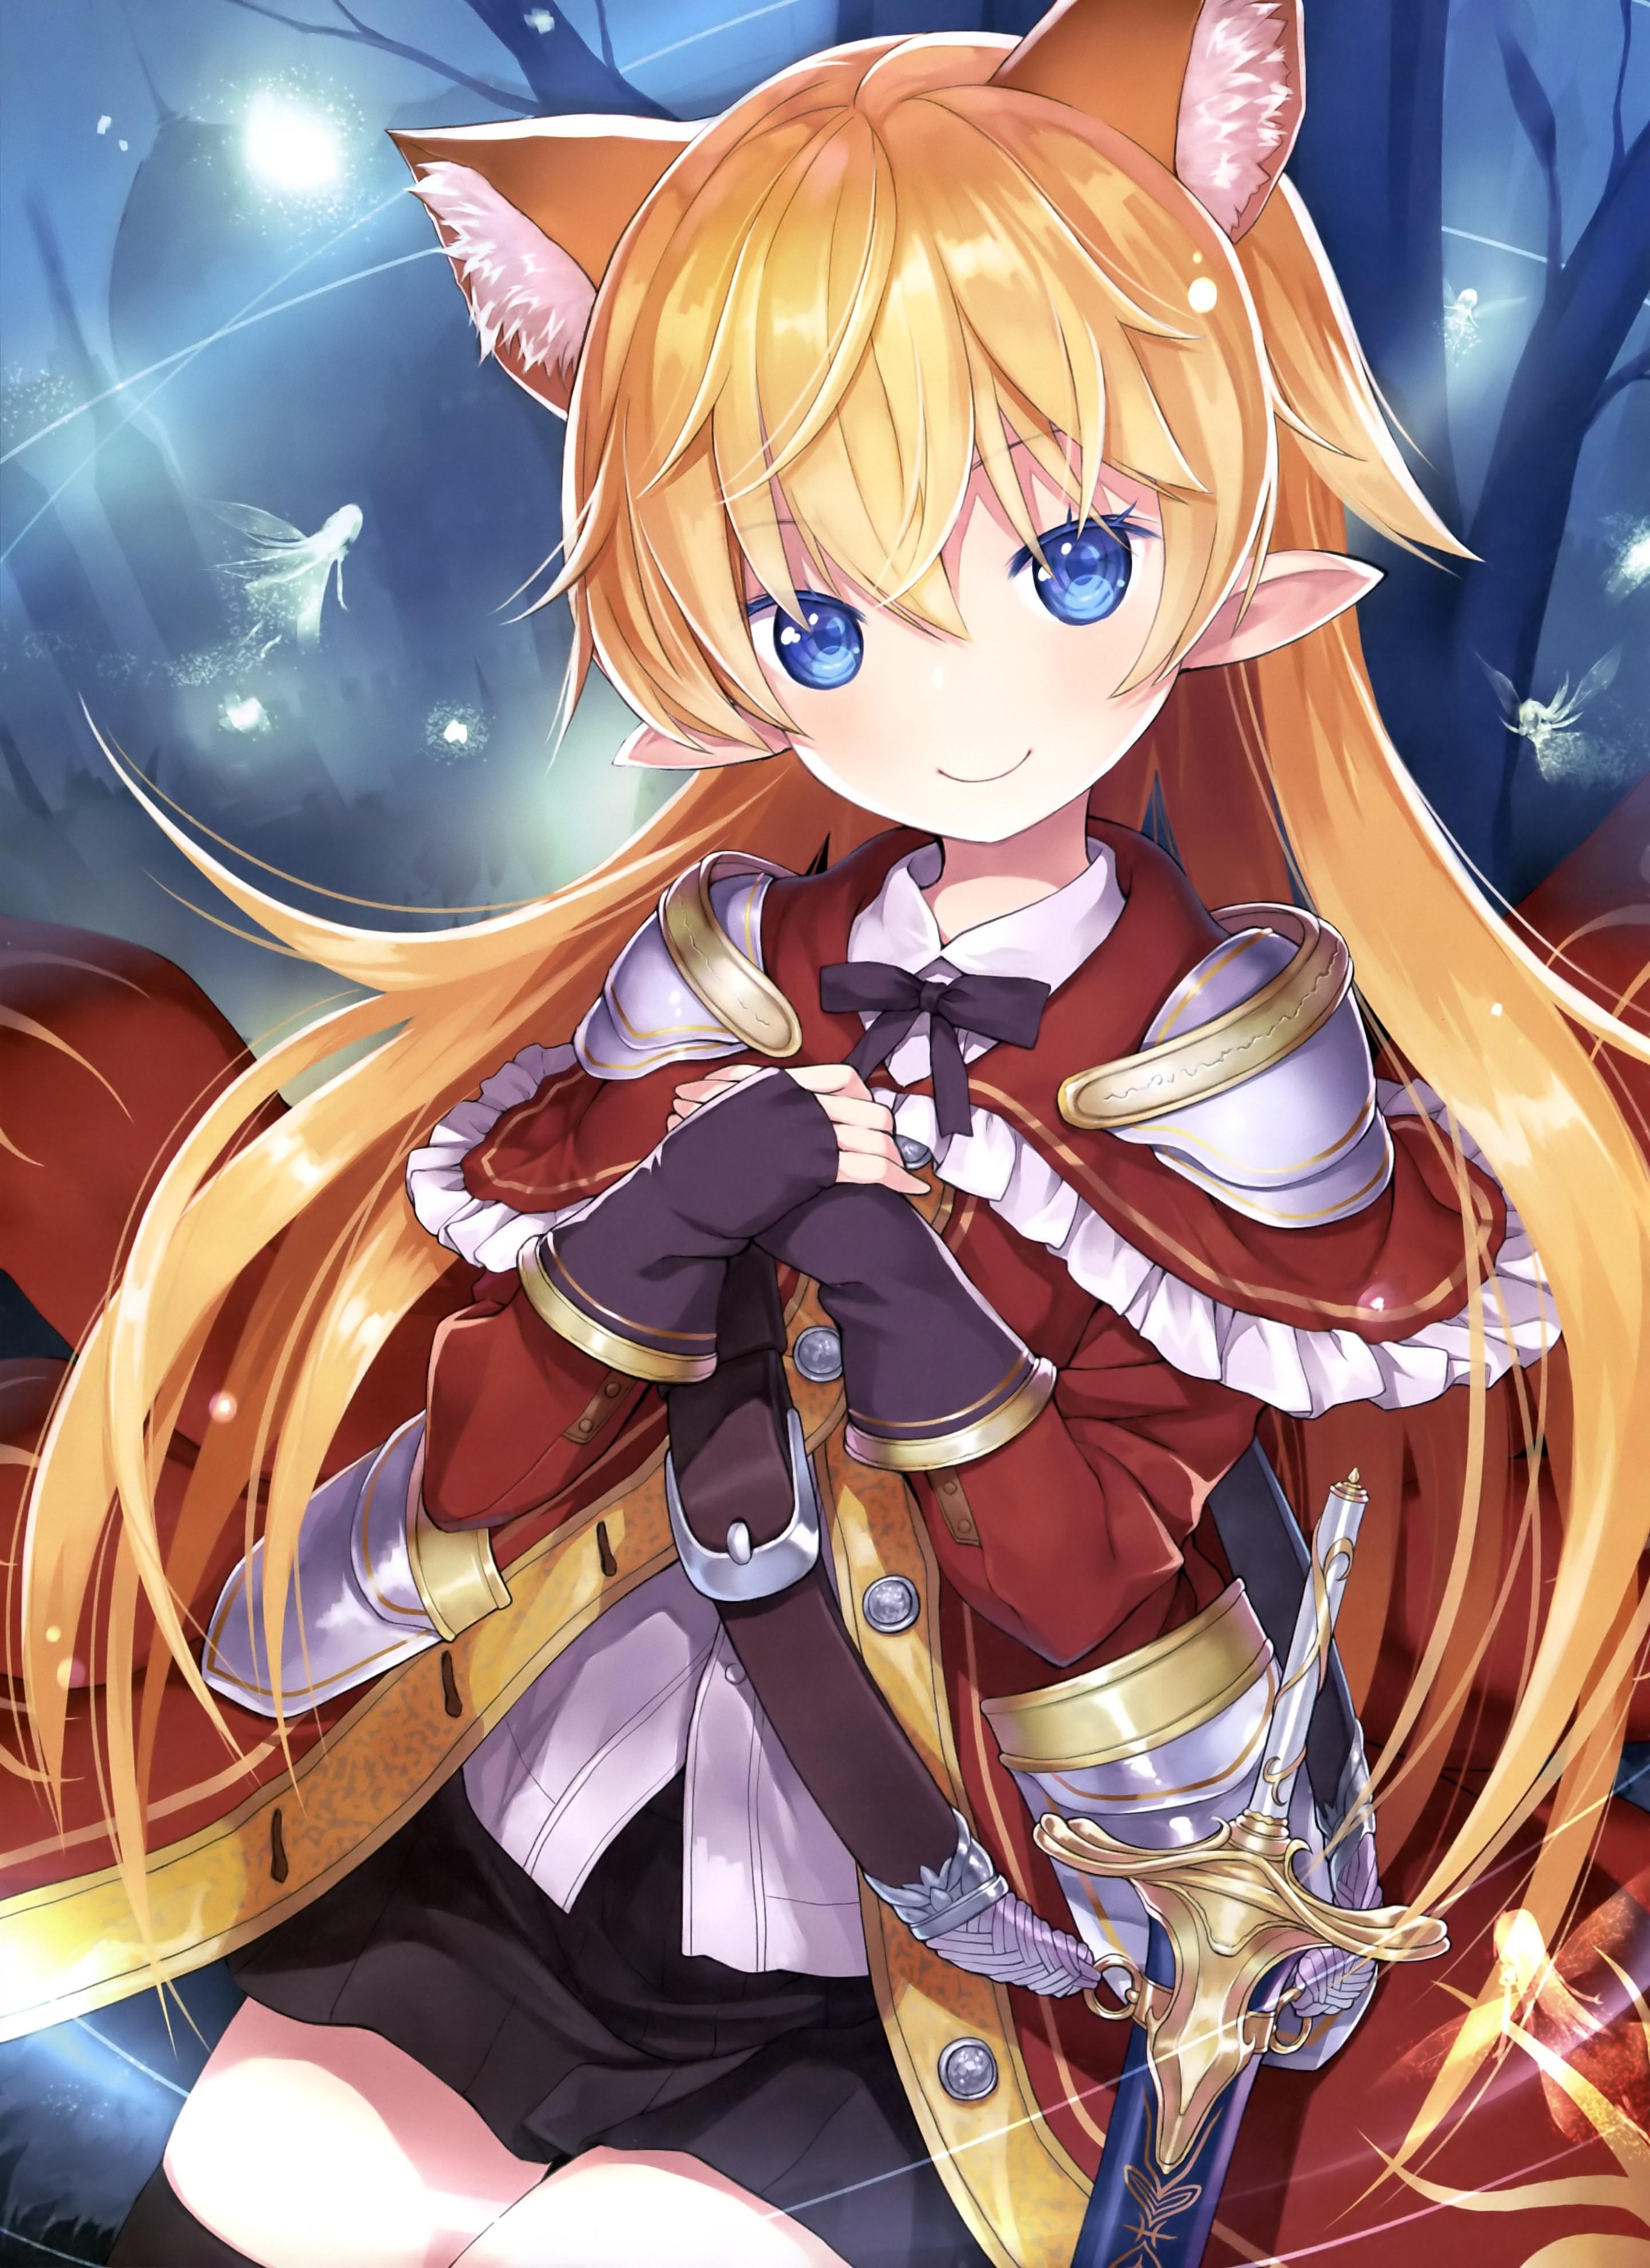 Illustration anime anime girls animal ears blue eyes armor sword kitsunemimi original characters mangaka